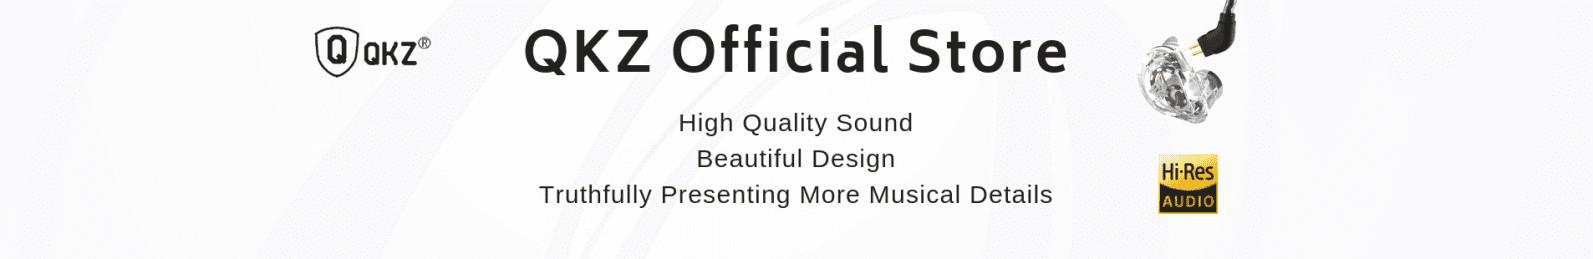 QKZ Official Store